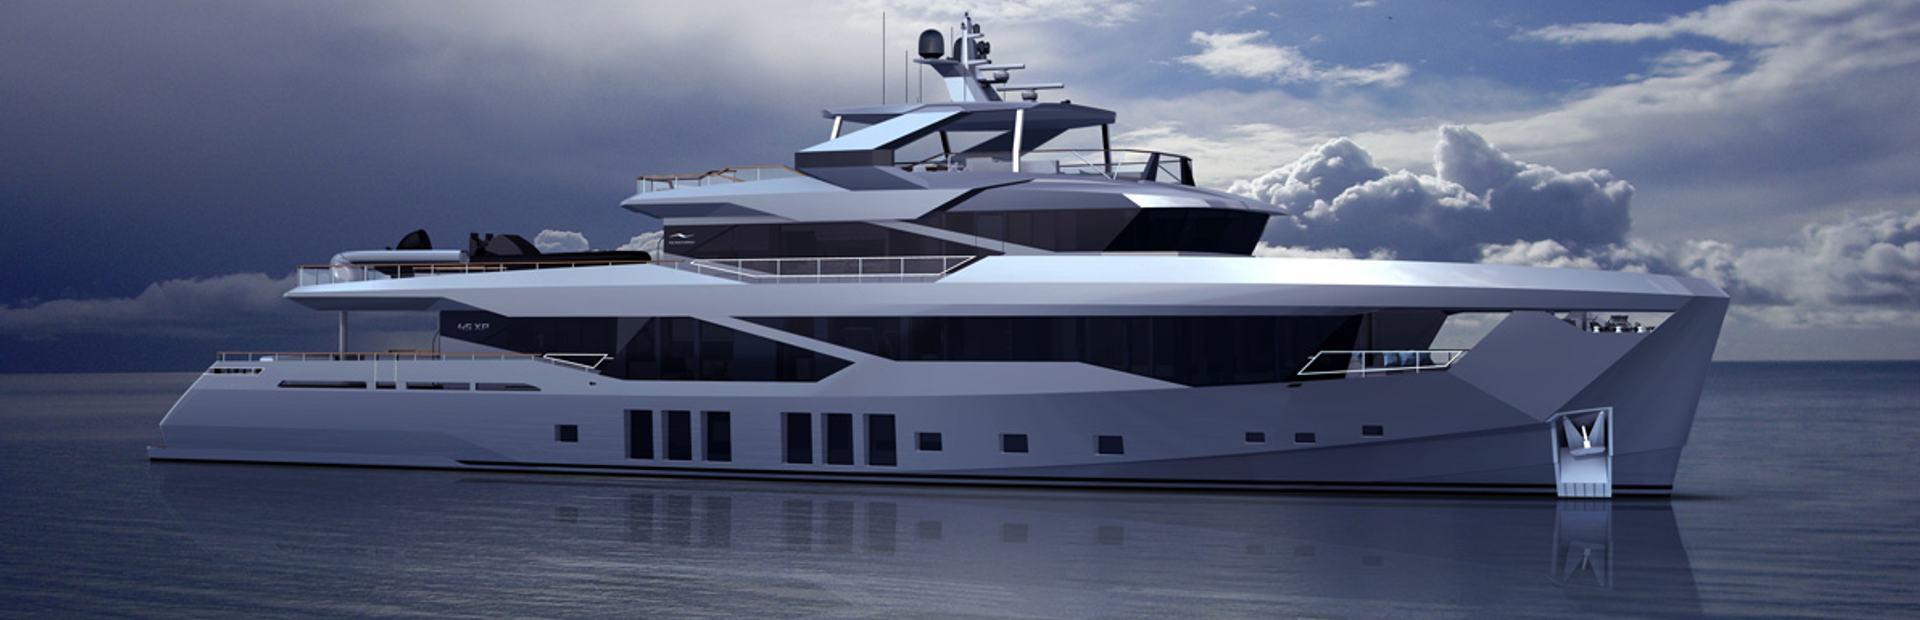 45 XP Yacht Charter